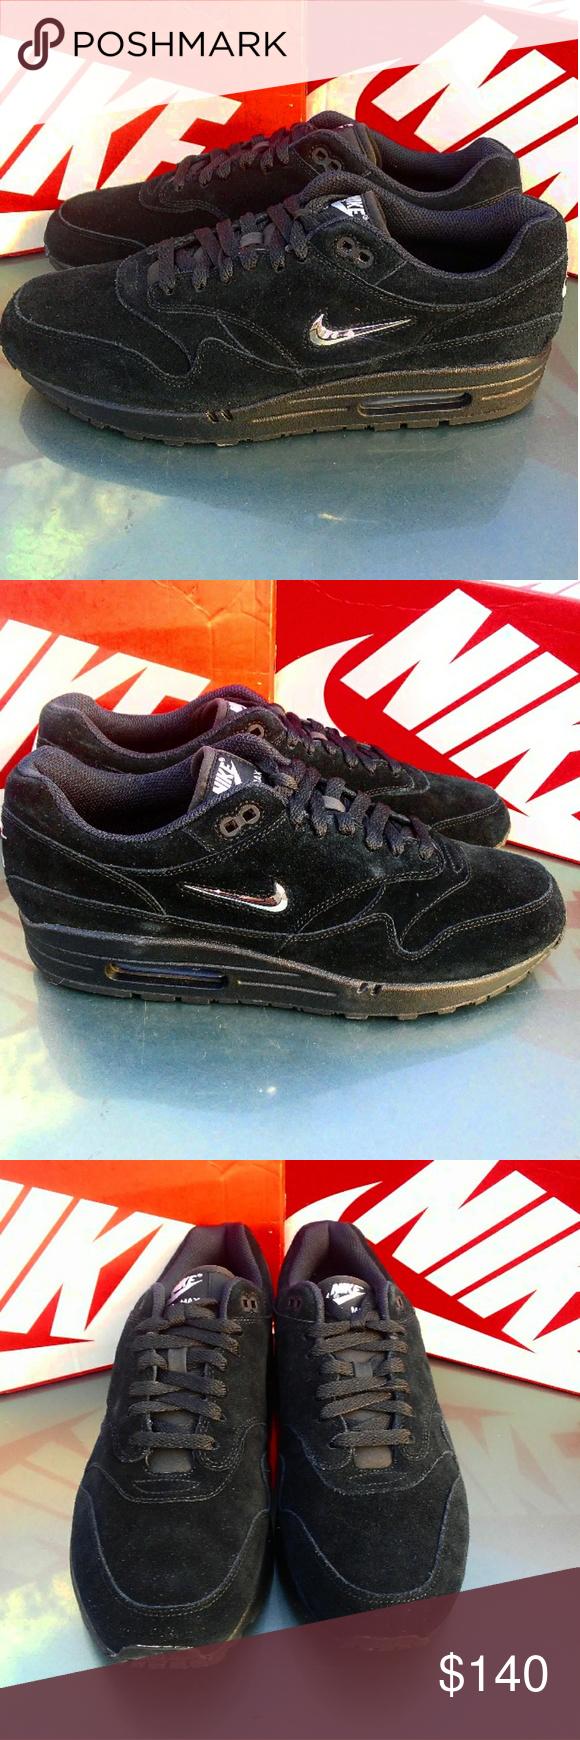 Men's Nike Air Max 1 Premium SC (Size 11) •Brand new in box •100% authentic  •Excellent condition •Size 11 men •Black color/Chrome color way -Style: ...